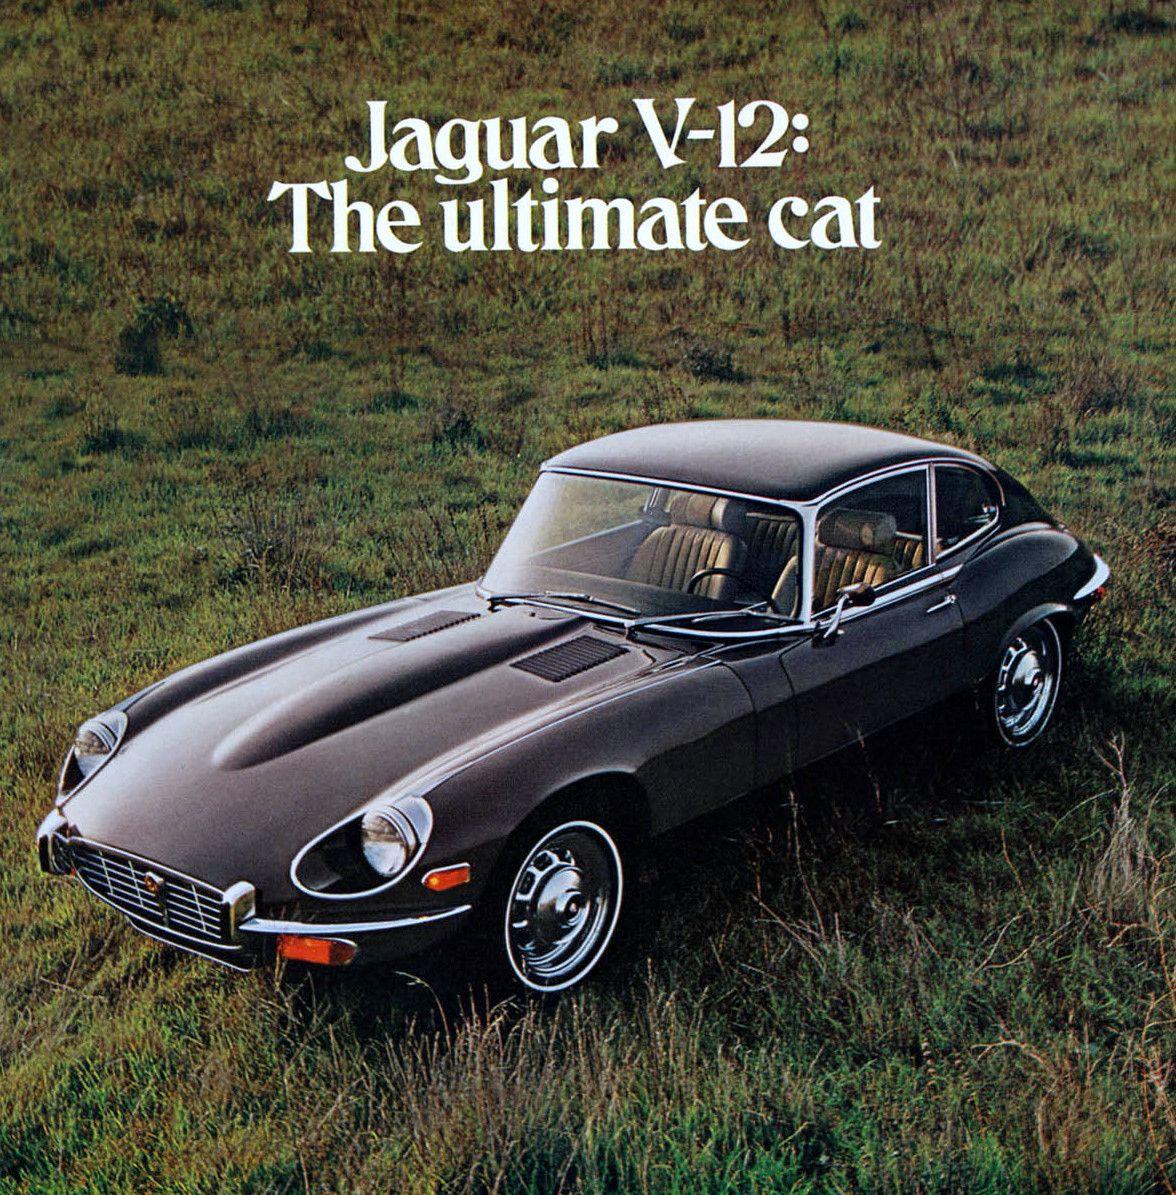 1972 jaguar v12 e type coupe advertisement